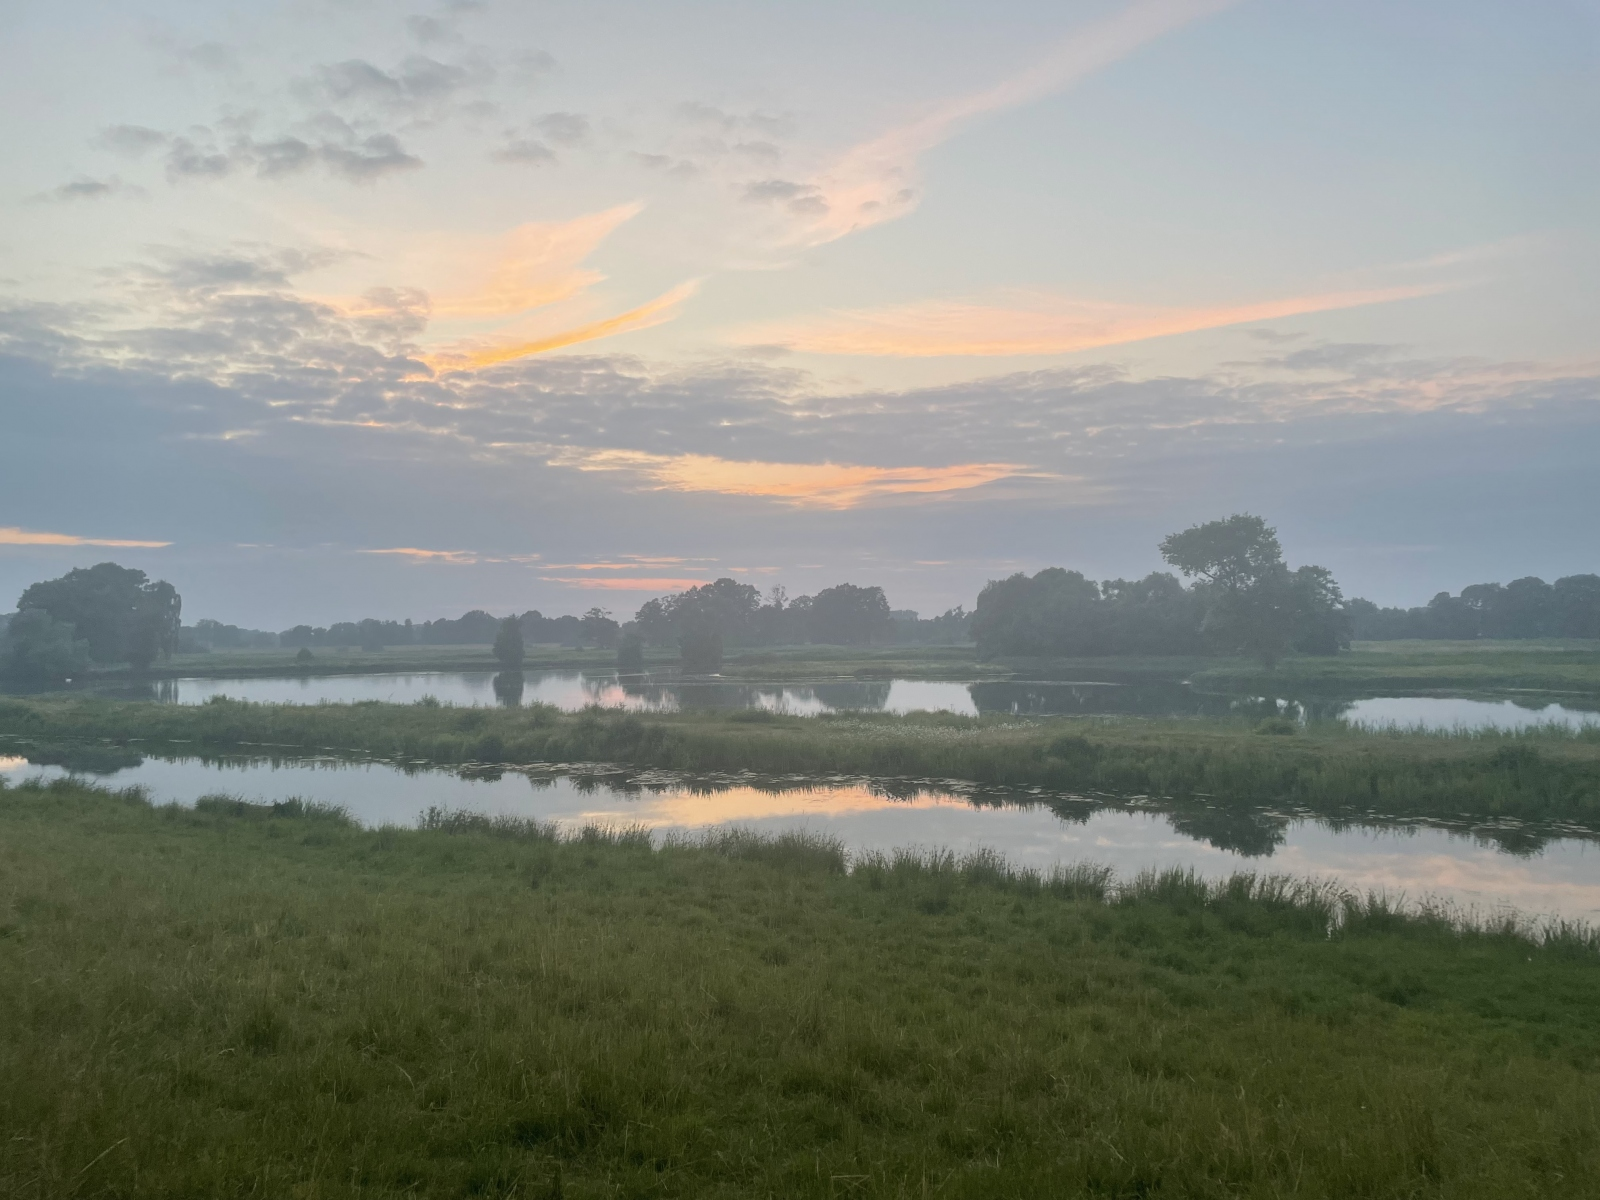 Gehrke-Anja-23-Challenge-Sonnenaufgang-m0Tzu